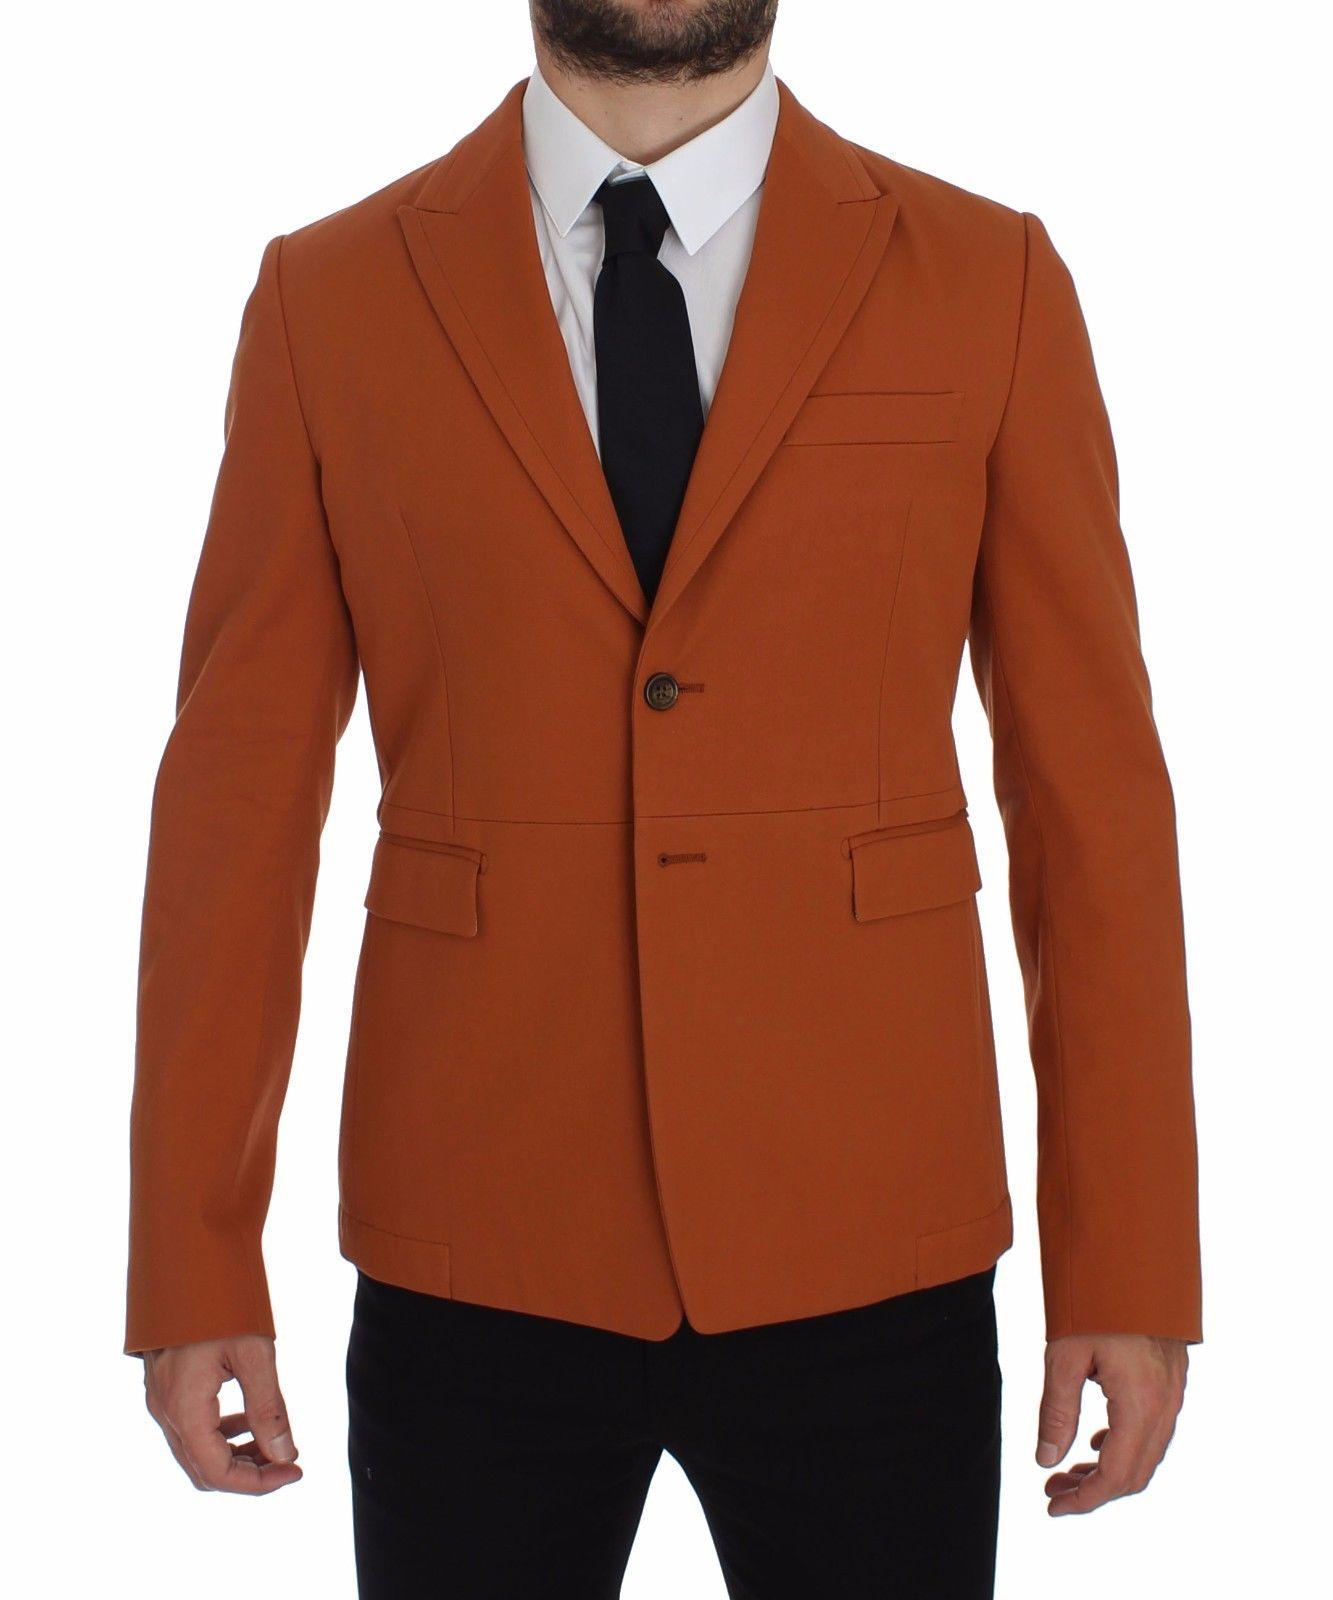 Dolce & Gabbana Men's Cotton Stretch Blazer Orange GTT10104 - IT54   XL